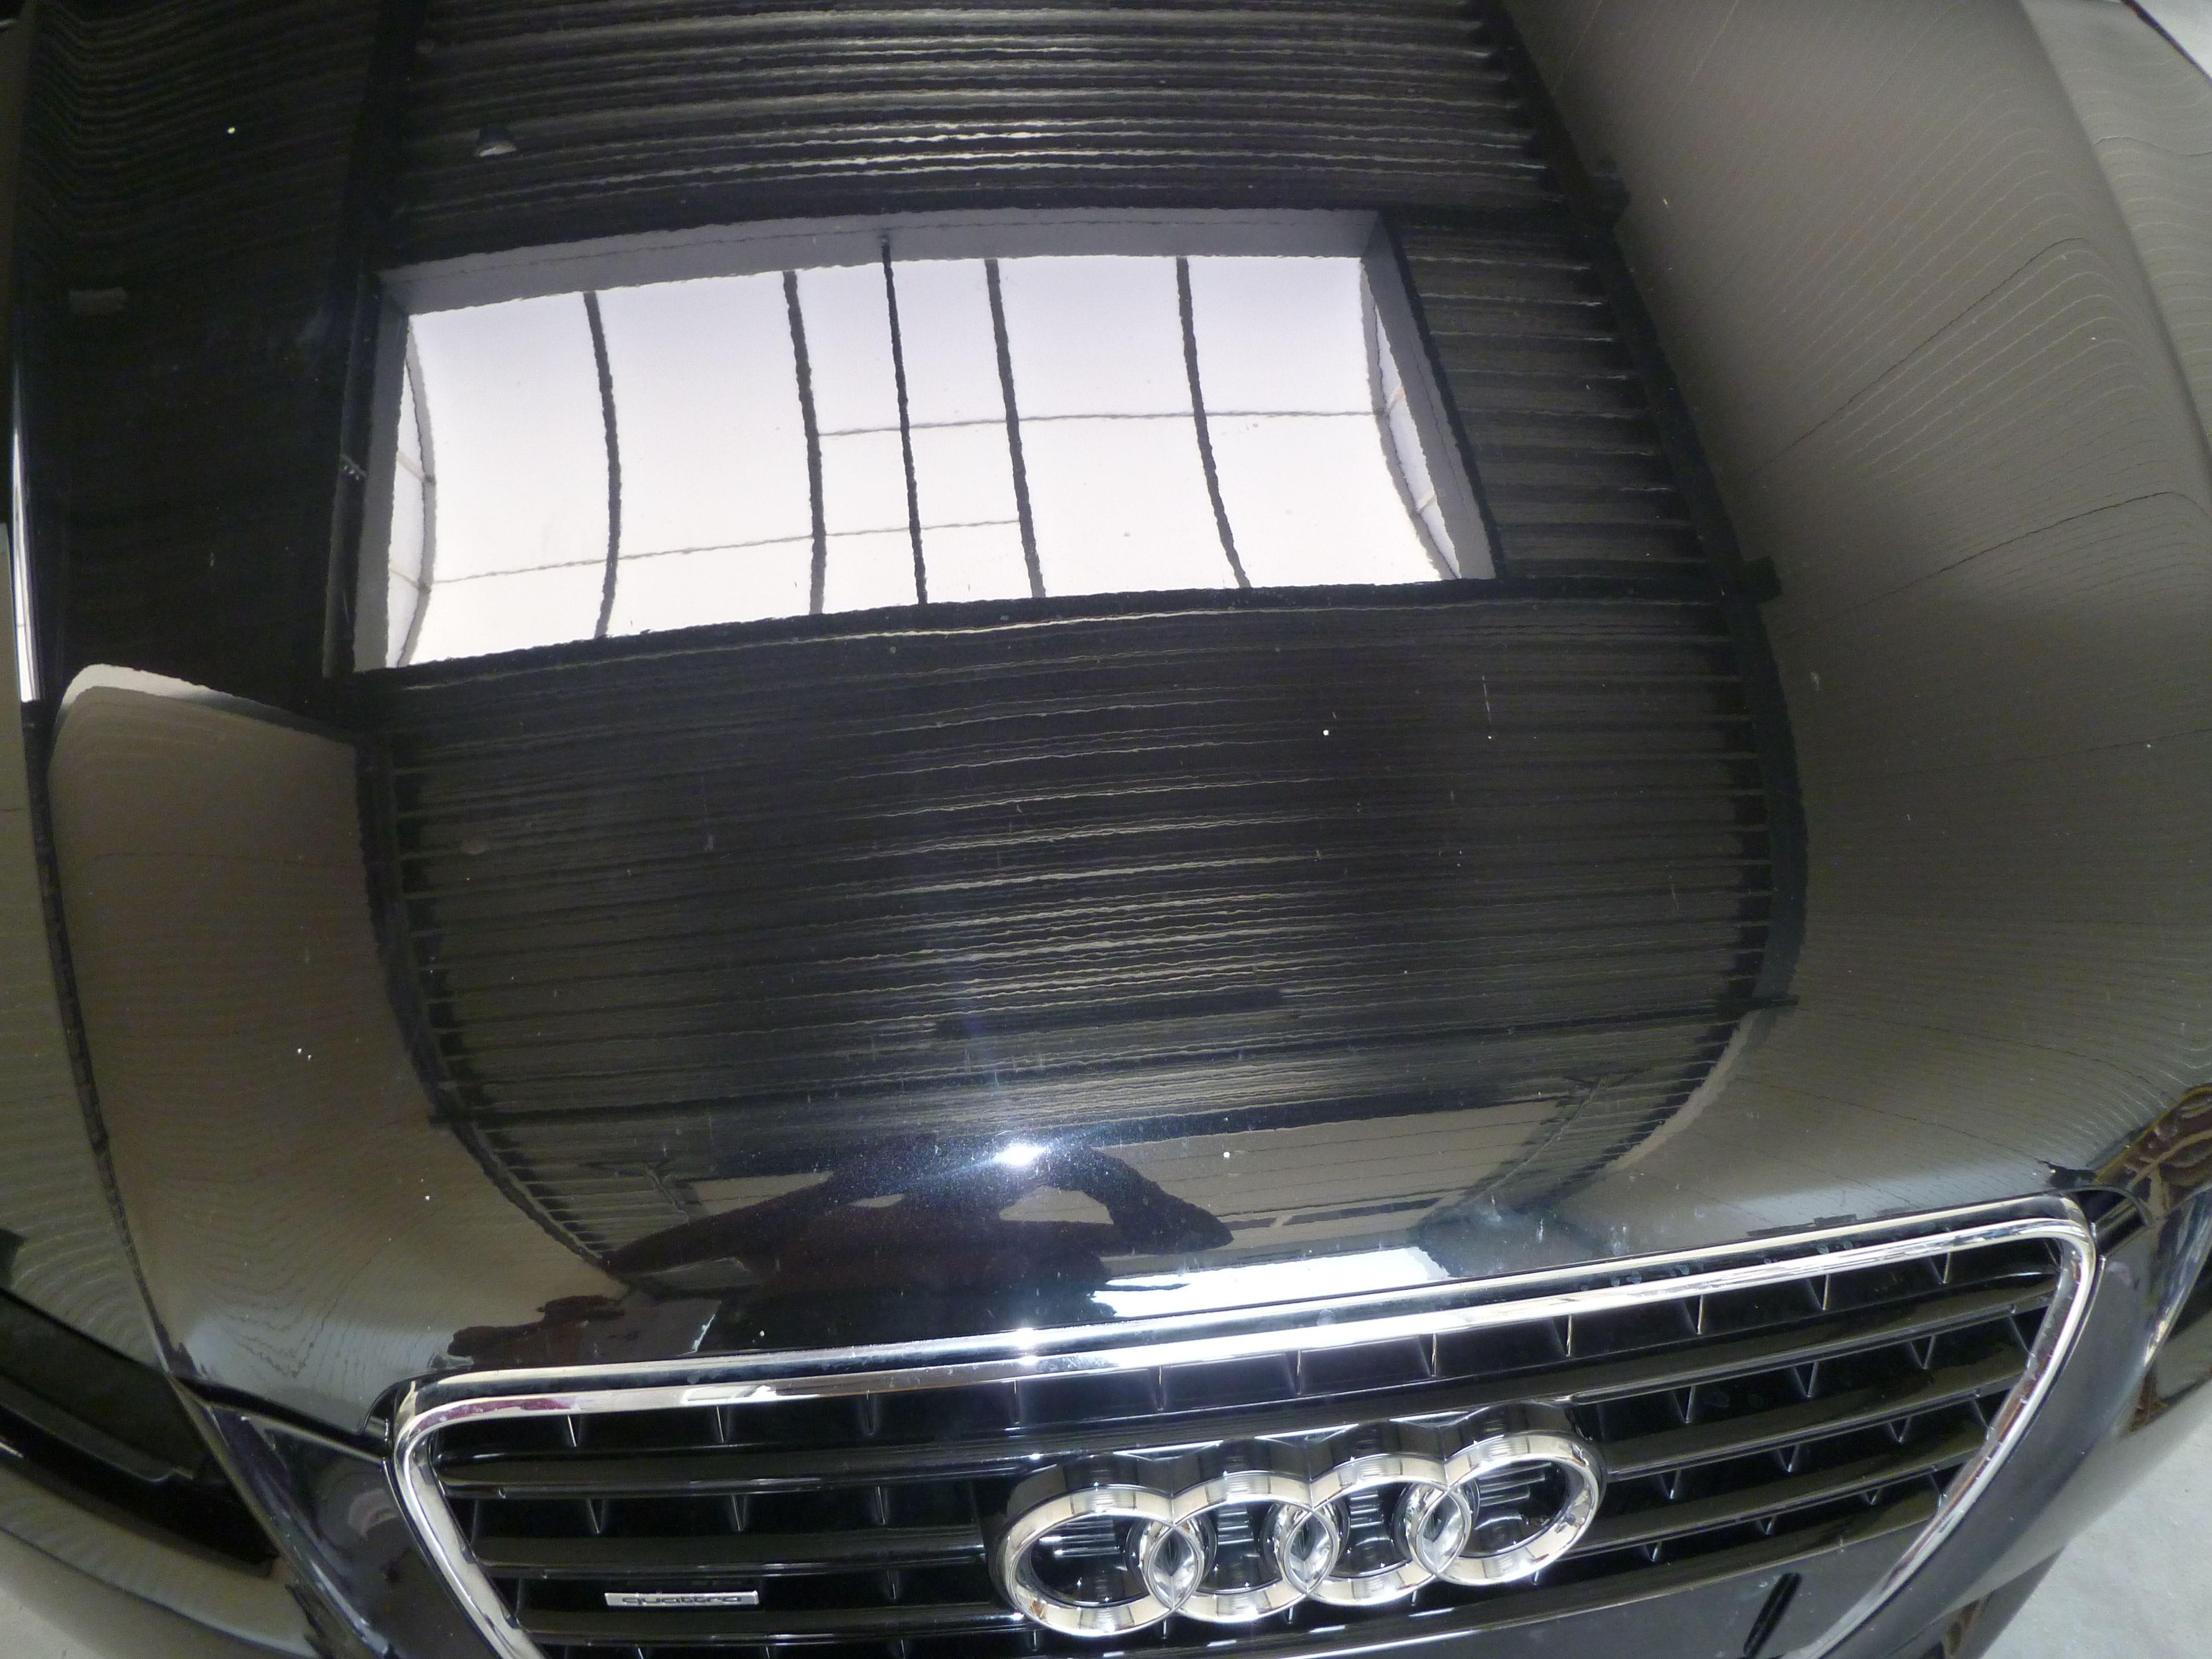 Audi A5 coupe met Metallic Witte Wrap, Carwrapping door Wrapmyride.nu Foto-nr:4696, ©2021